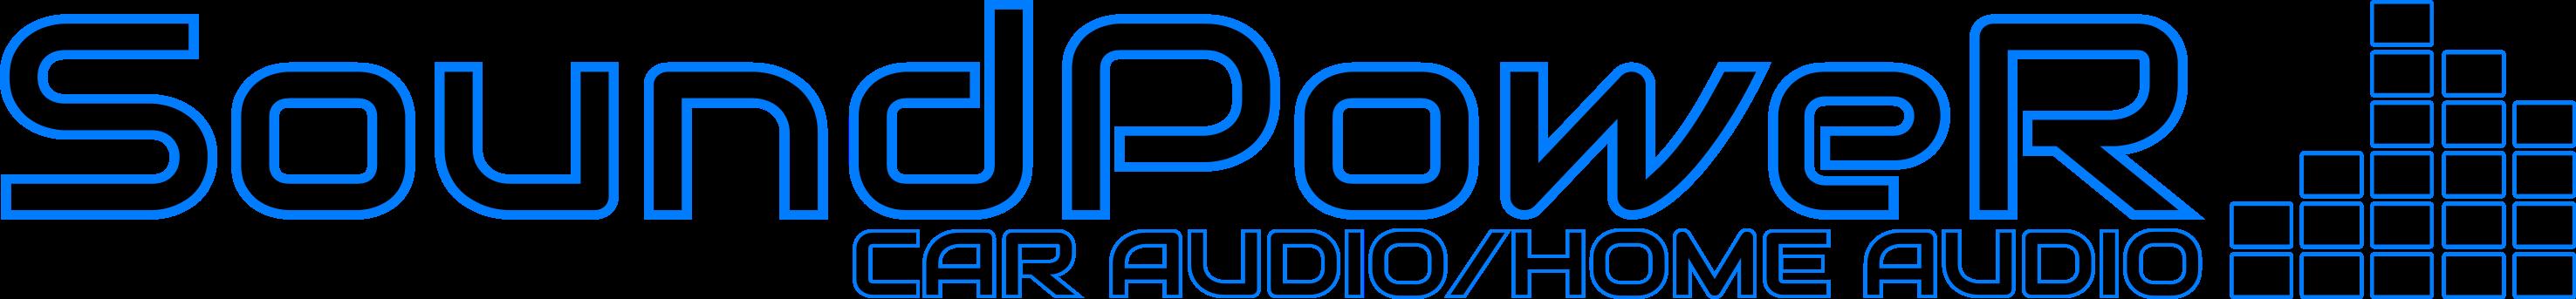 SoundPoweR